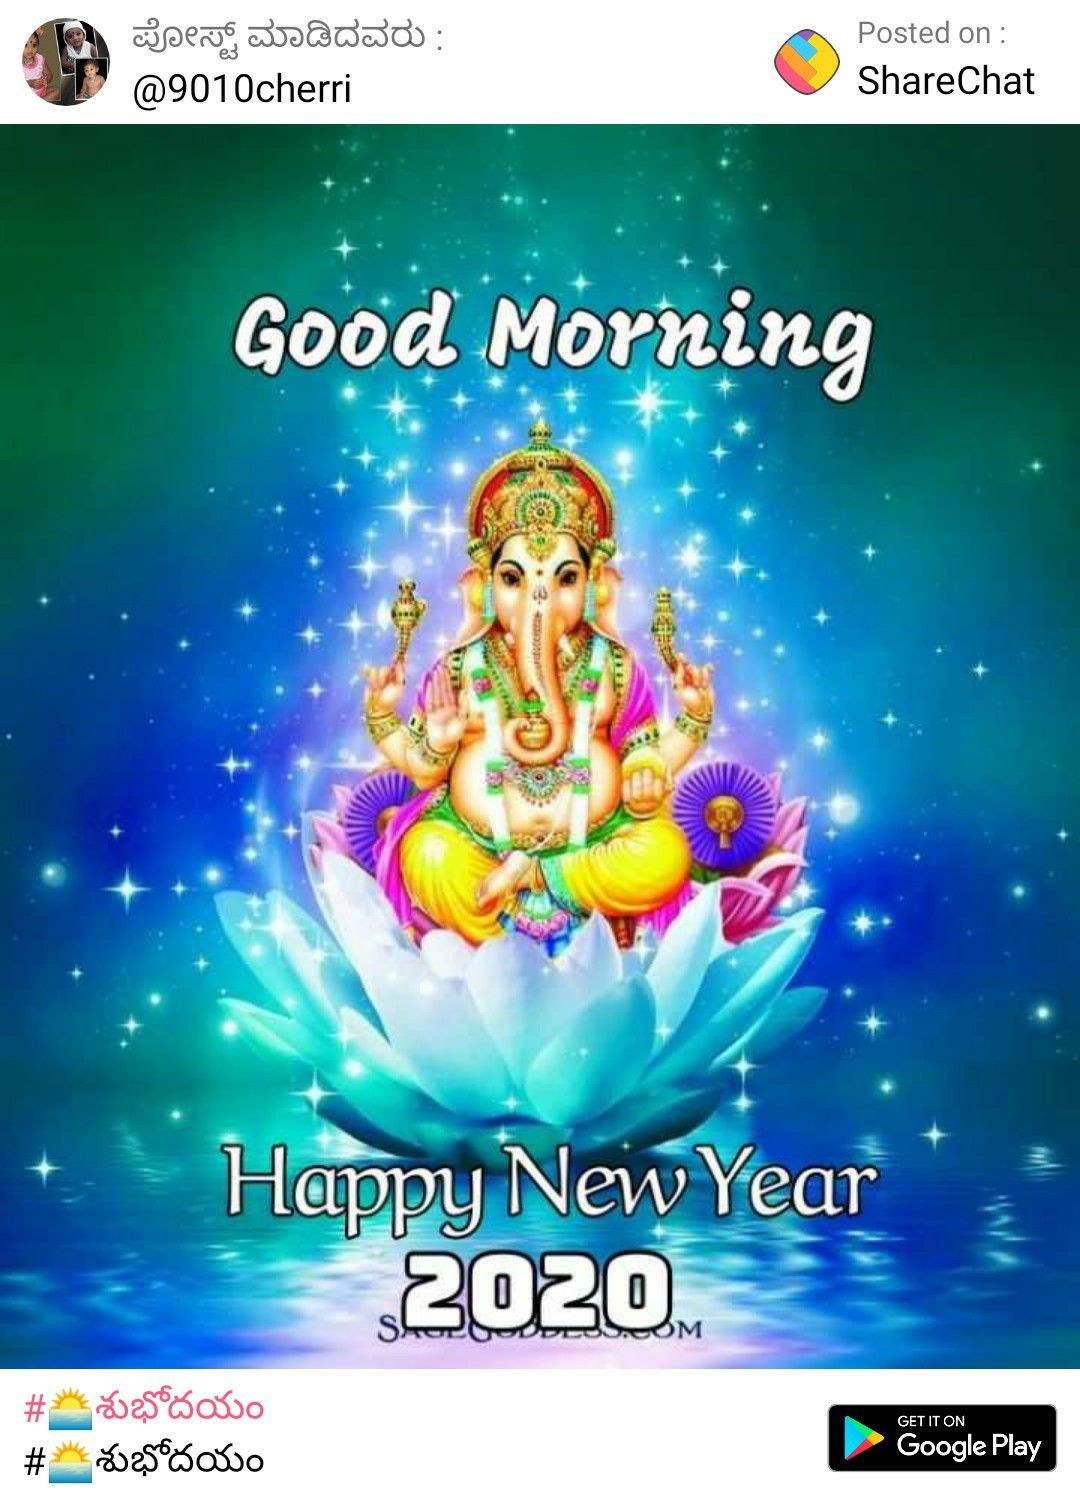 Pin By Vishwanath On Festival Good Morning Images Hd Good Morning Happy Good Morning Images